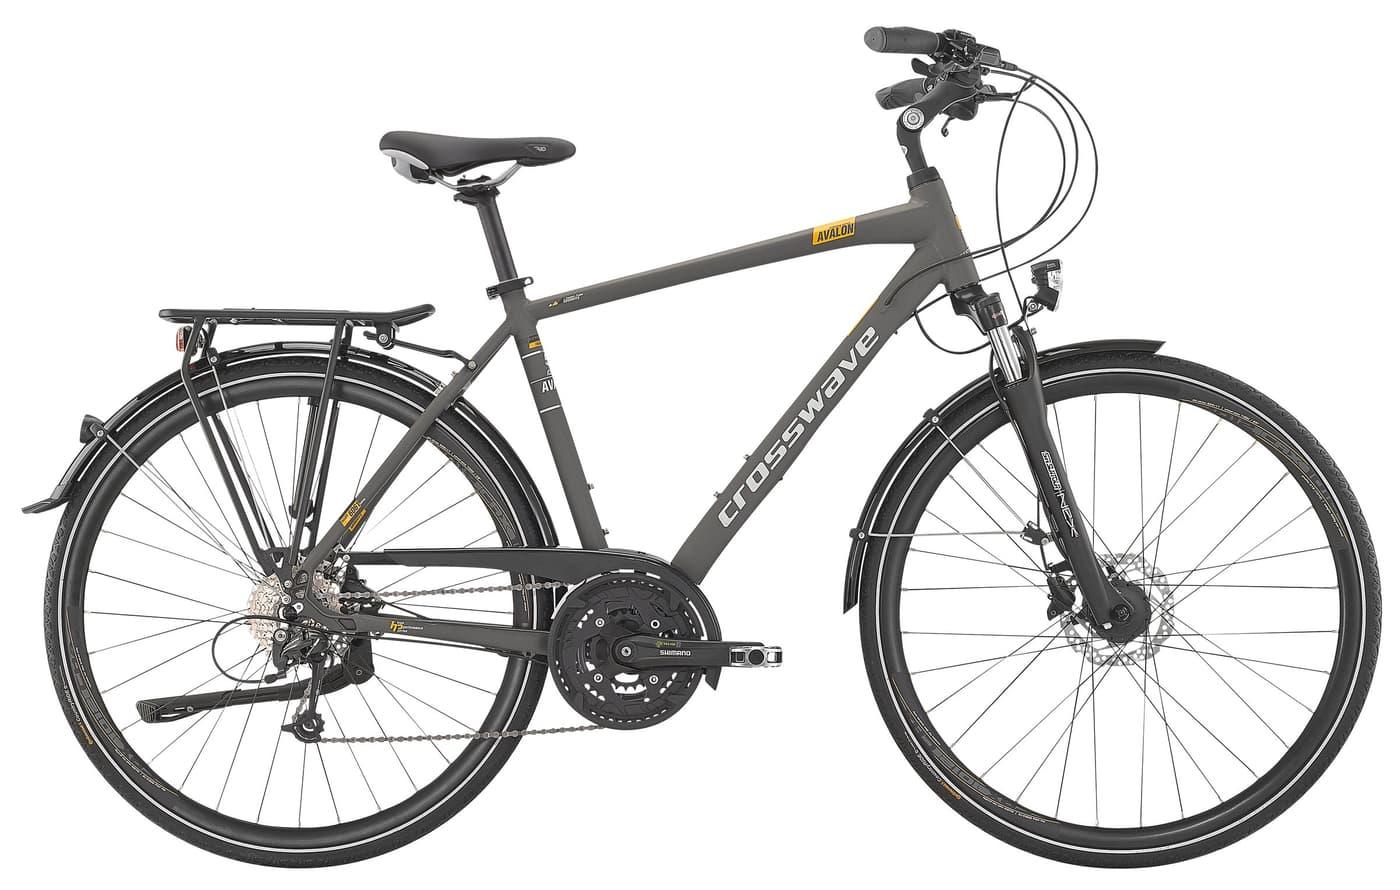 Crosswave Avalon 28 Bicicletta Da Trekking